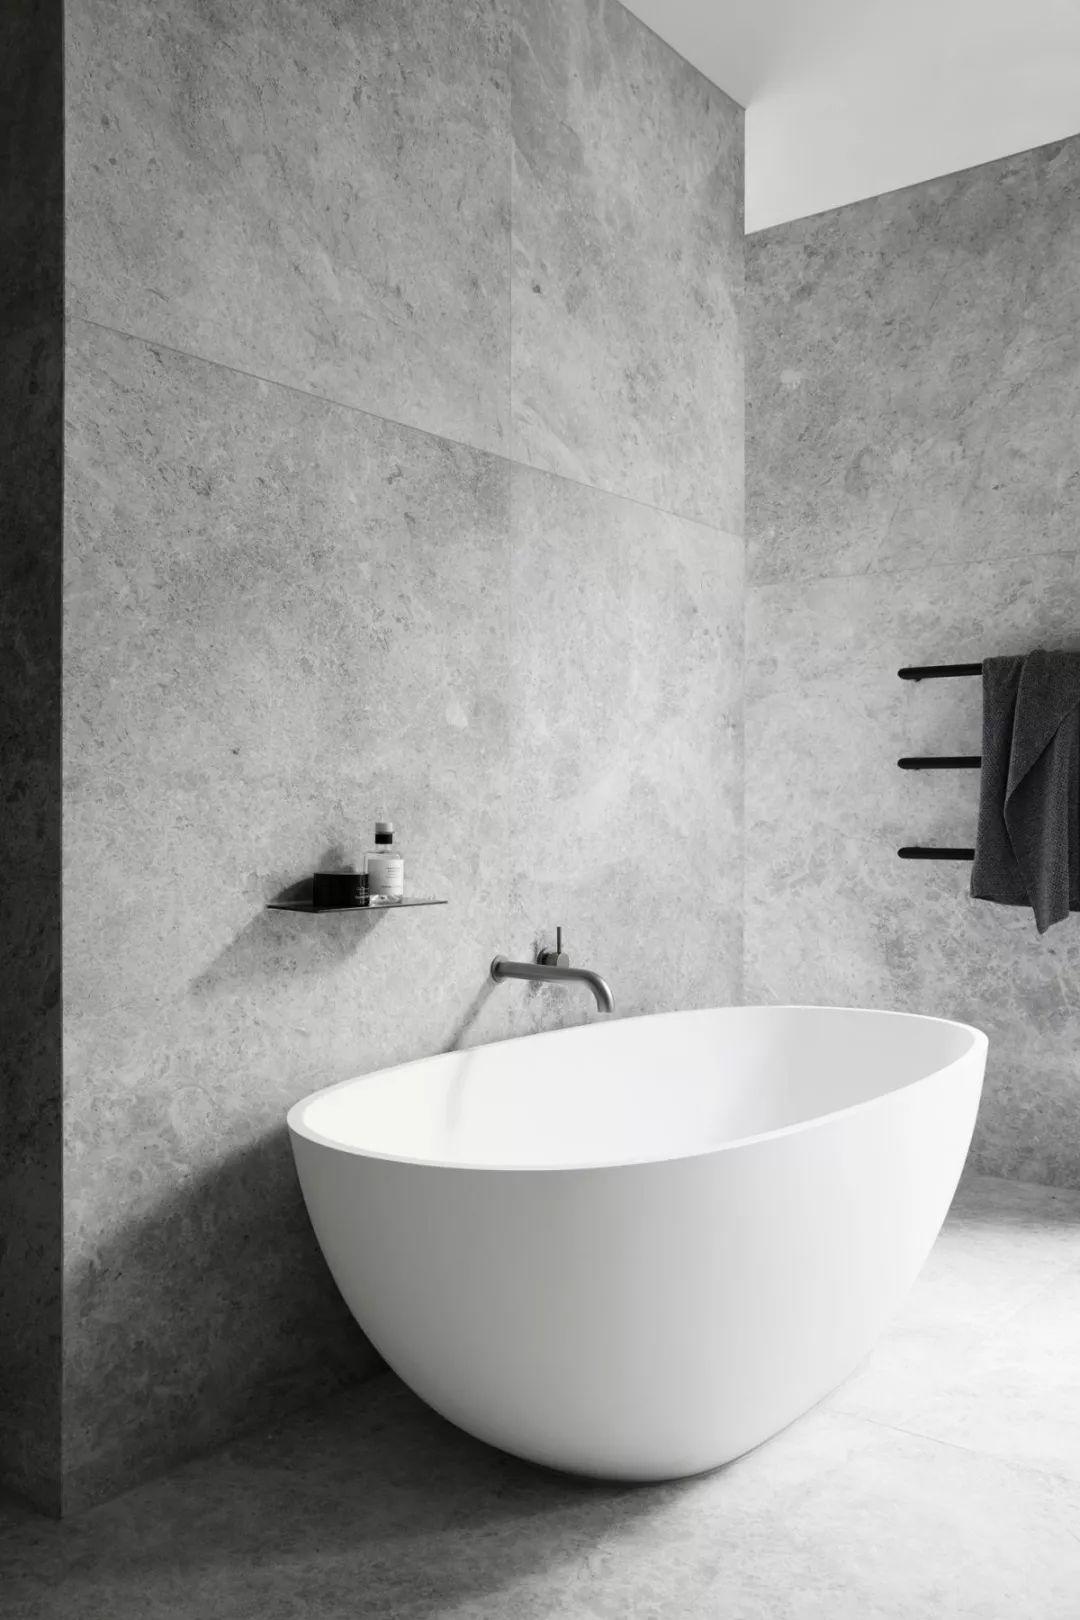 Mim Design作品:现代低调灰色系住宅